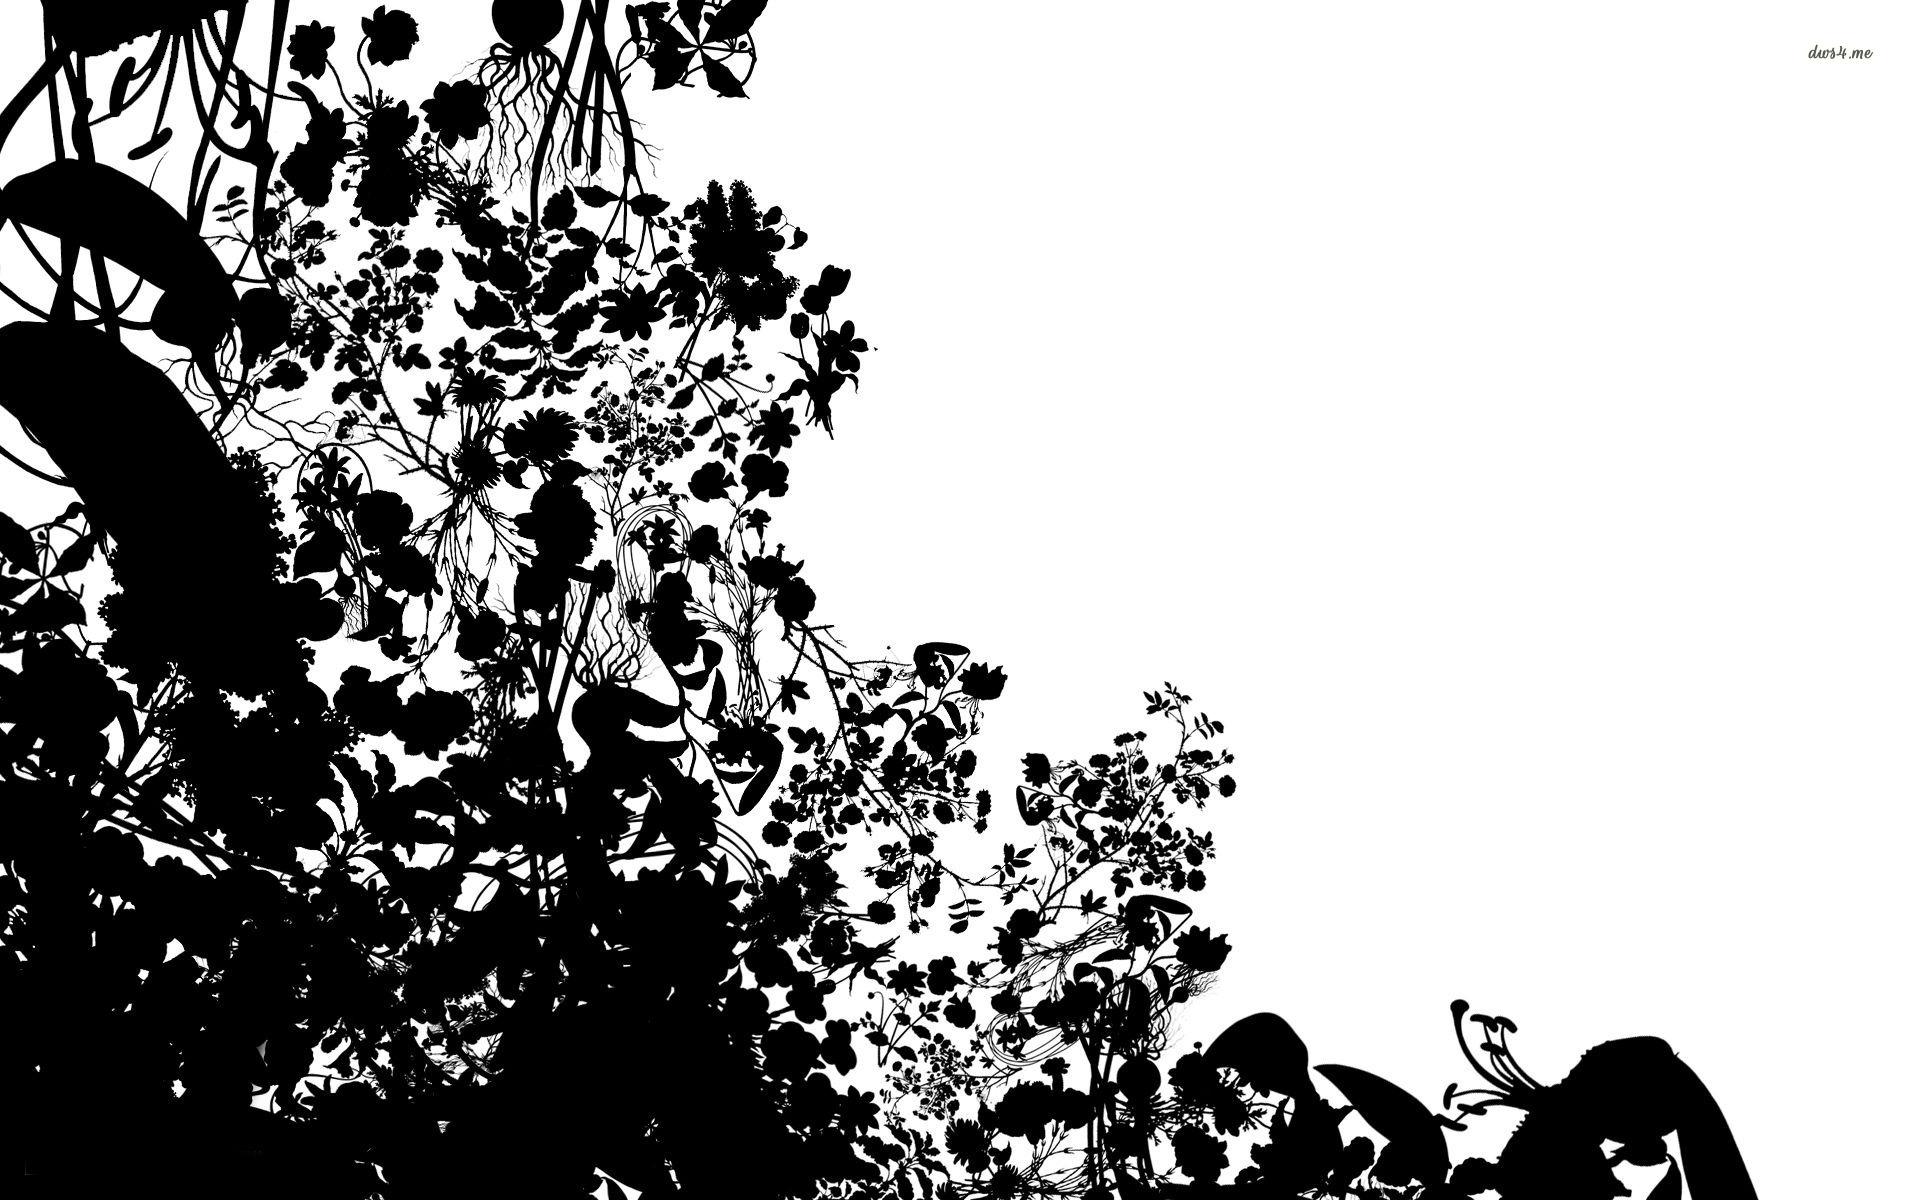 Flower Silhouette Wallpaper Vector Wallpapers 1805 Clip Art